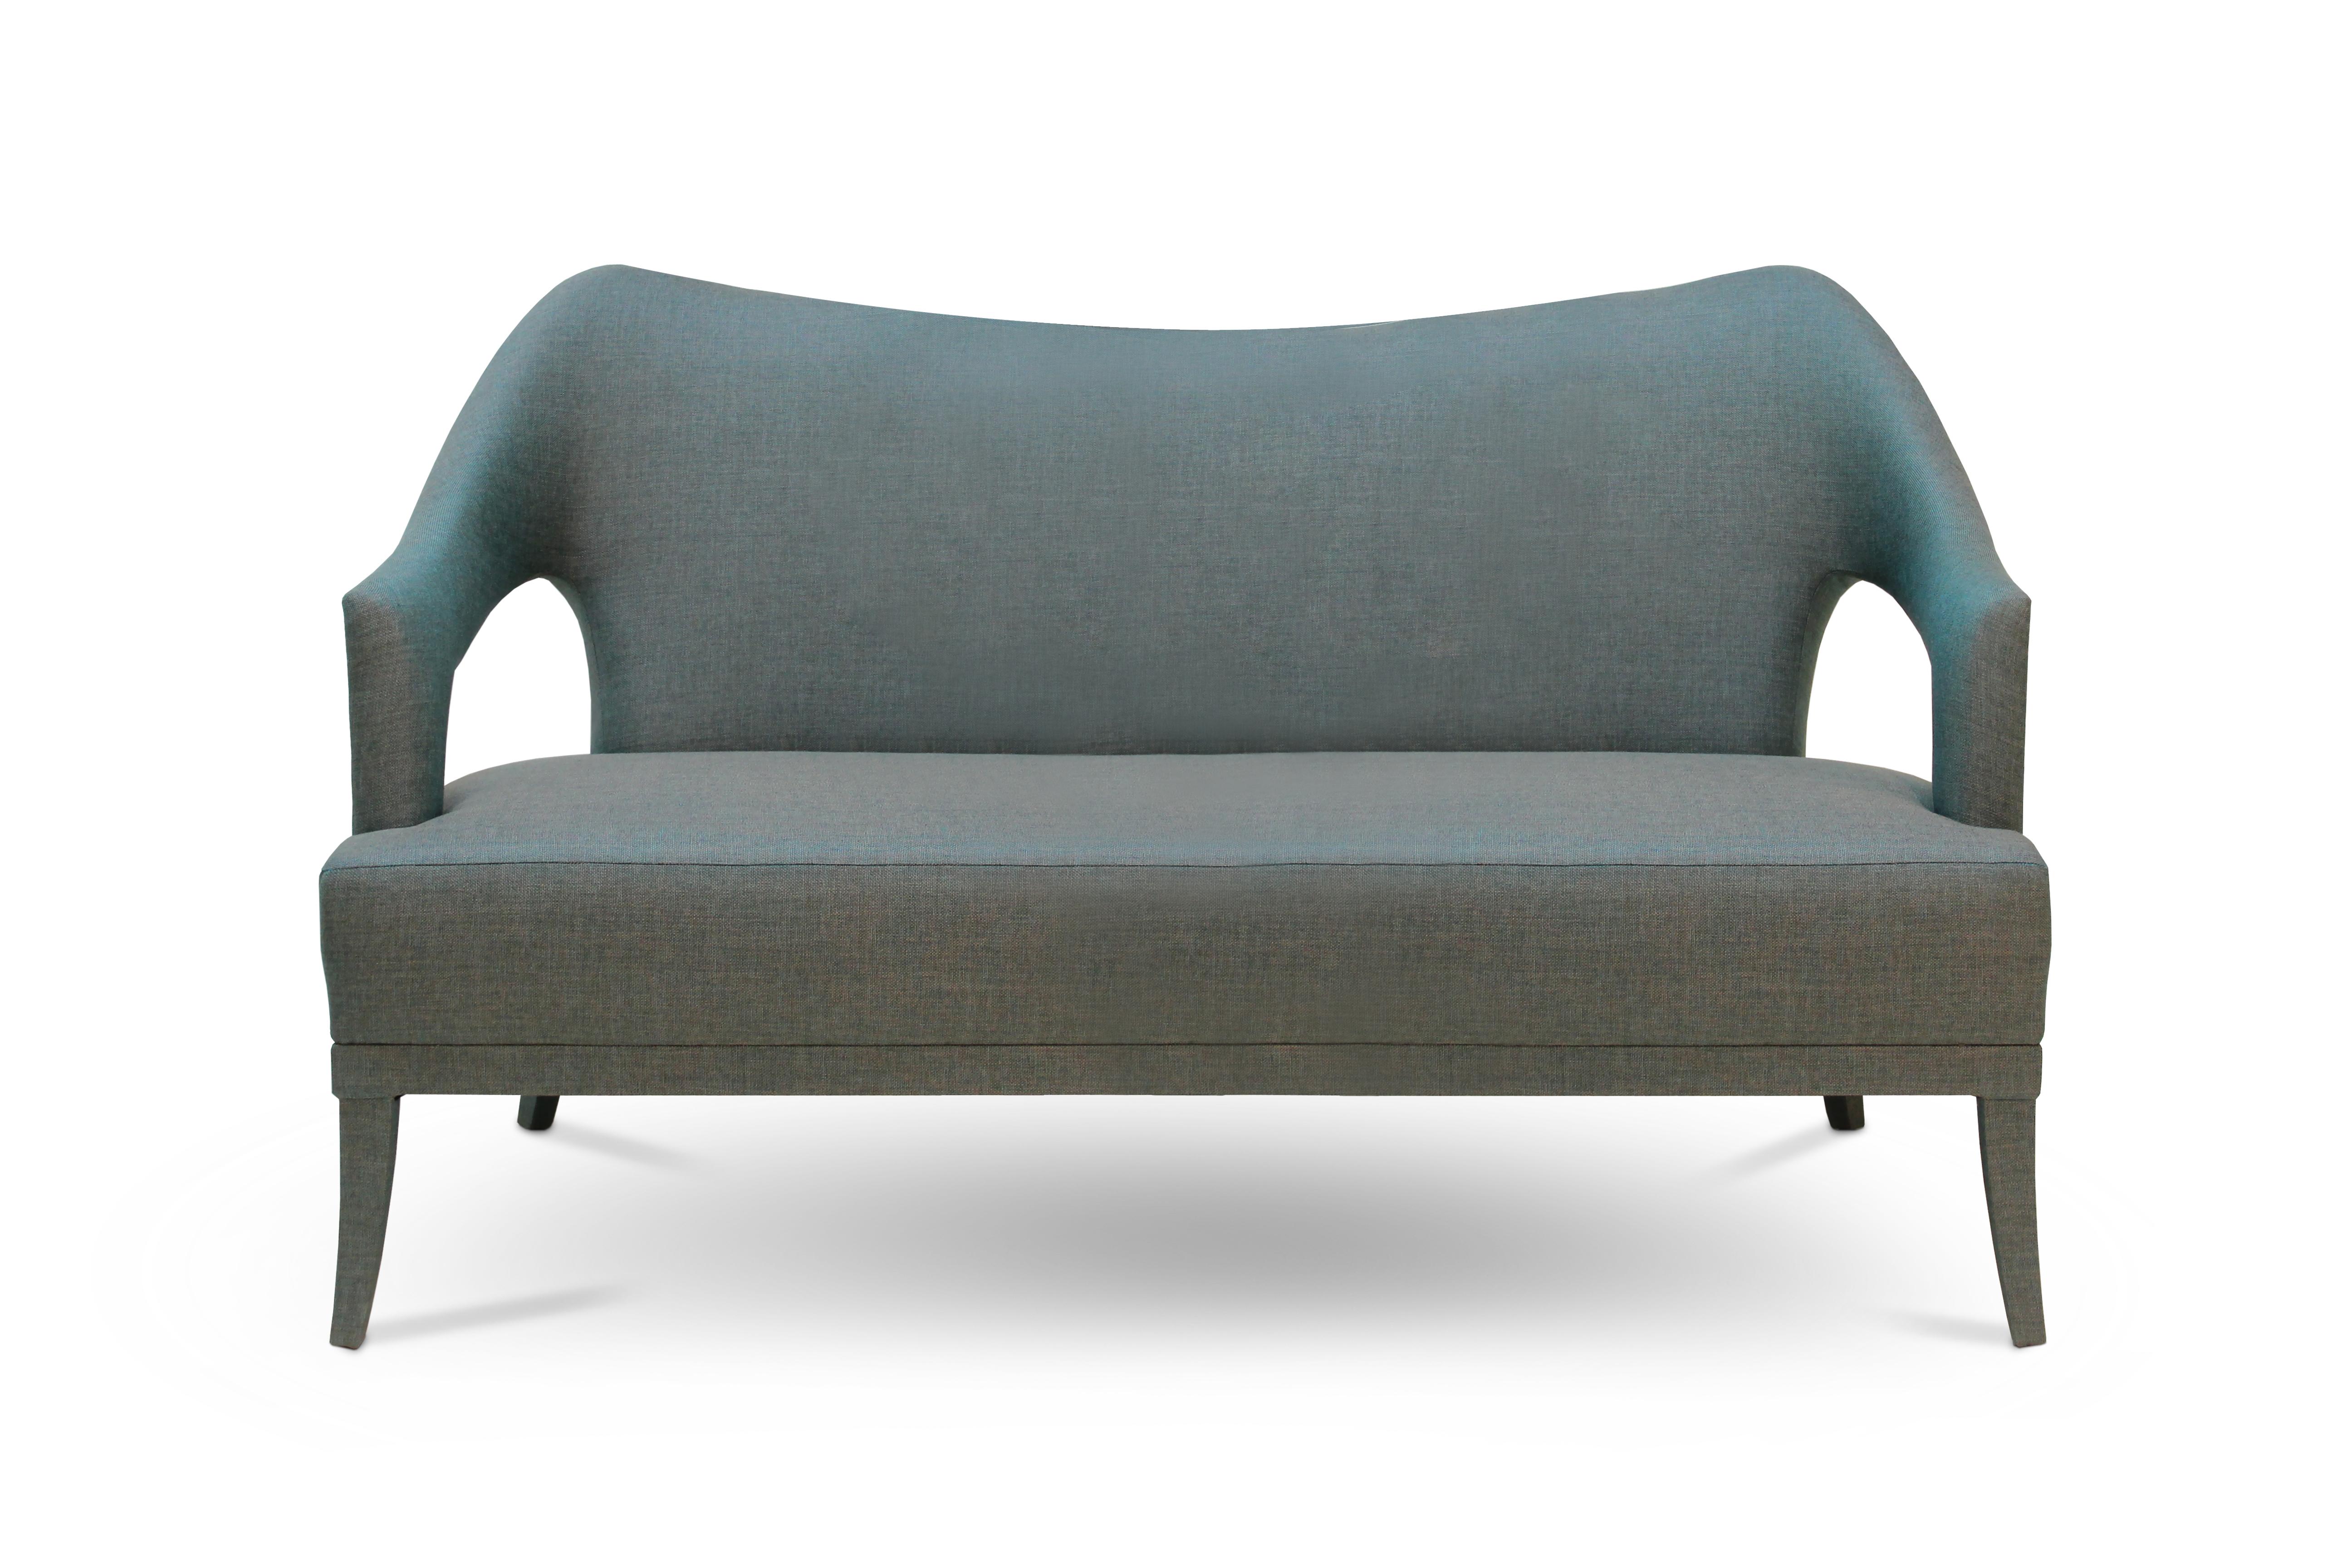 Raise Sofa Height Raise Sofa Height Couch Gallery